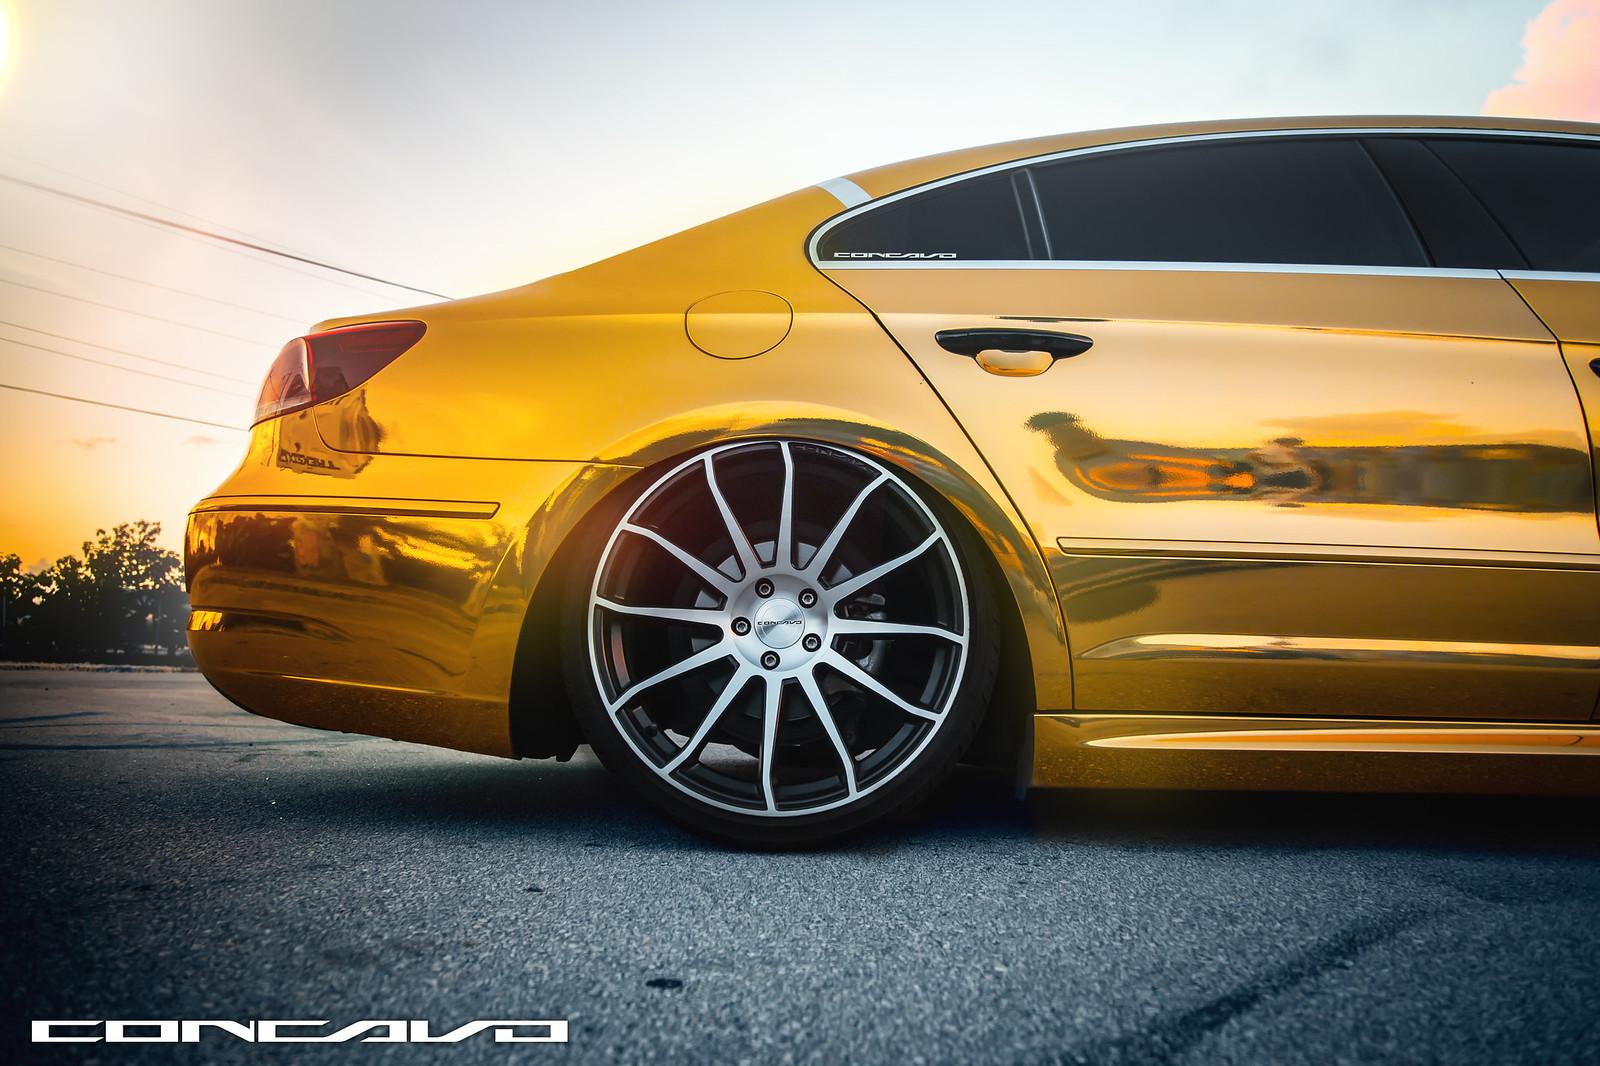 Gold Volkswagen CC | Concavo CW-12 | RodWraps | Miami ...